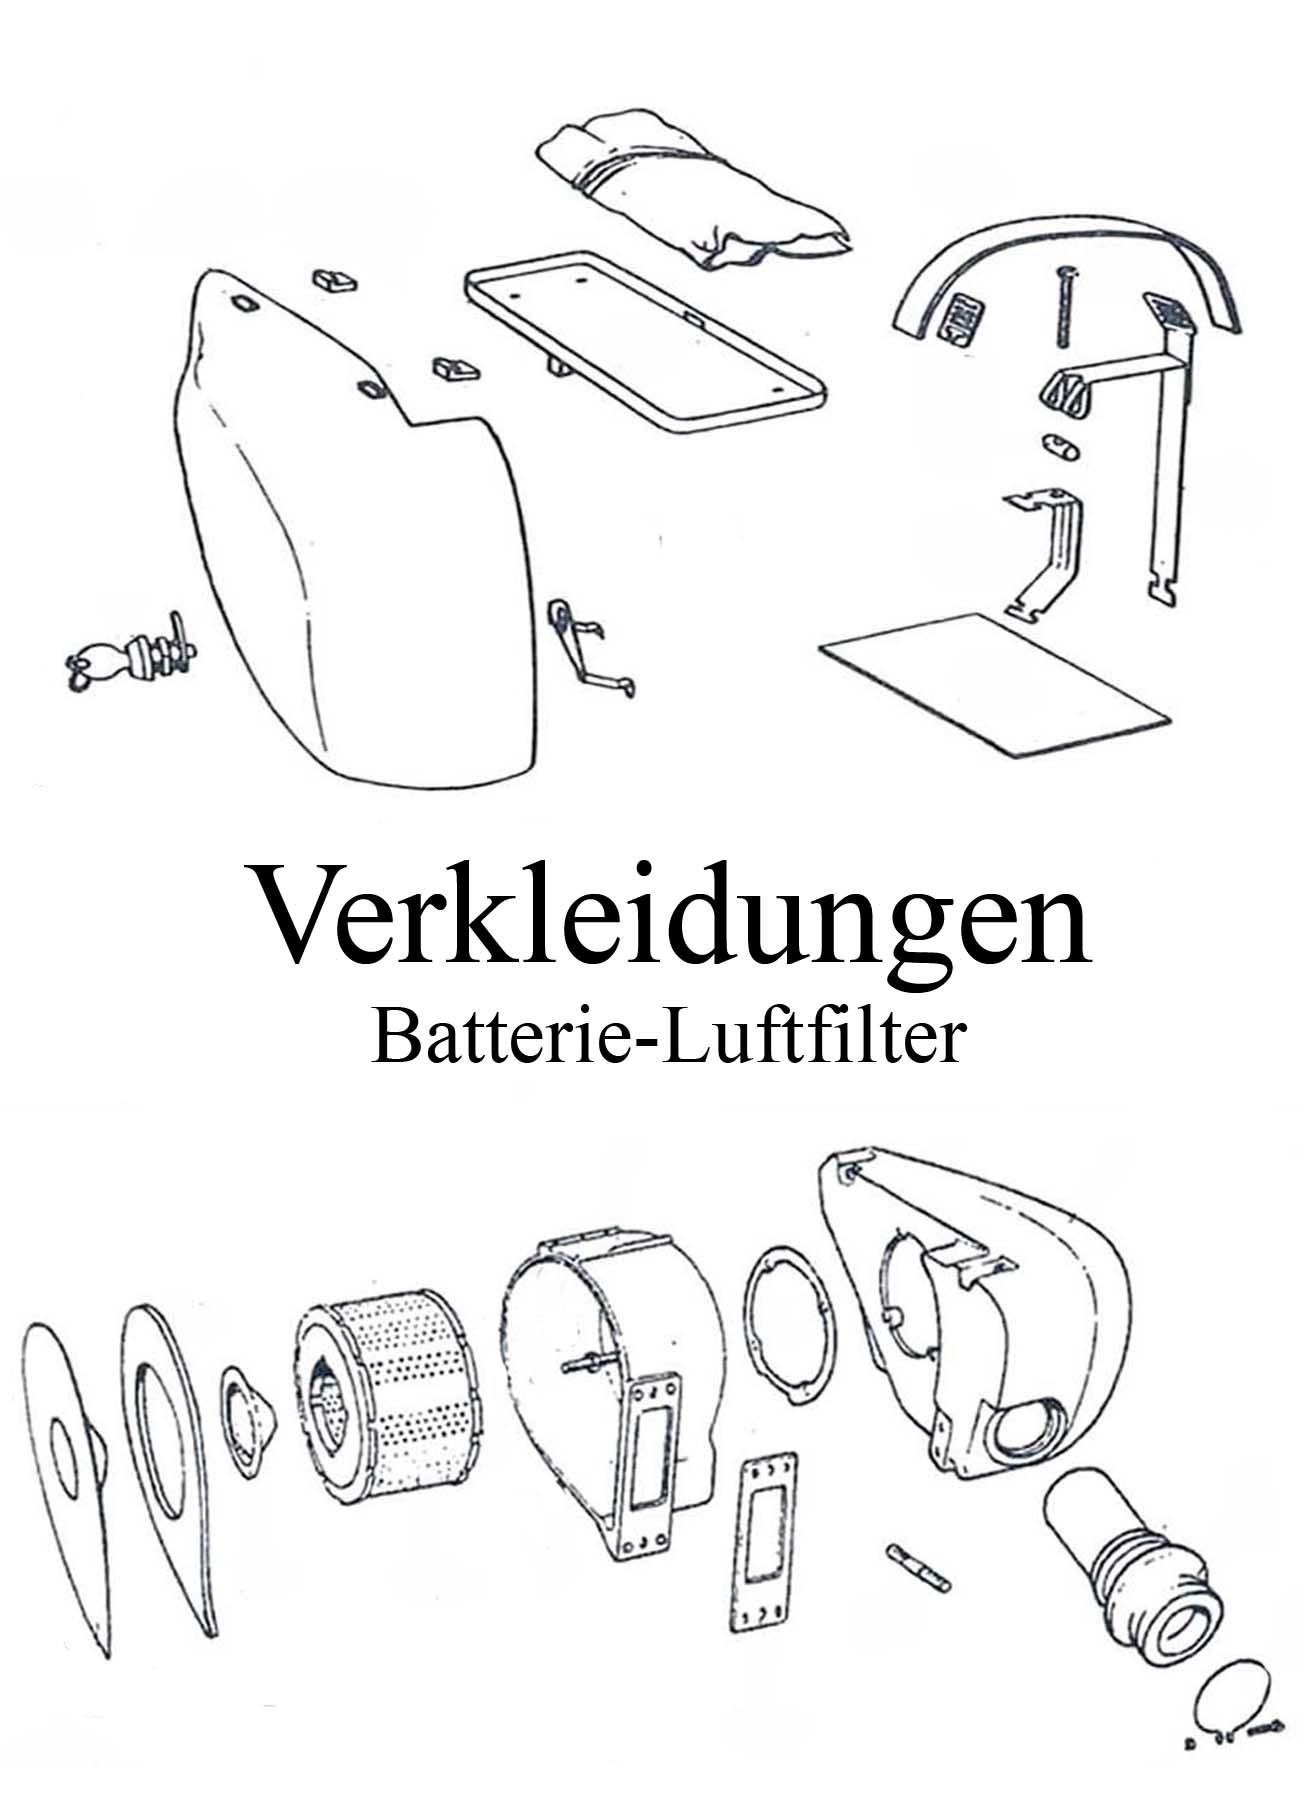 MZ ETZ 125-150 Ersatzteileliste Verkleidungen Seitendeckel Aufkleber Schloss Batteriespannband Werkzeugfach Luftfilter Dichtung Ansauggummi